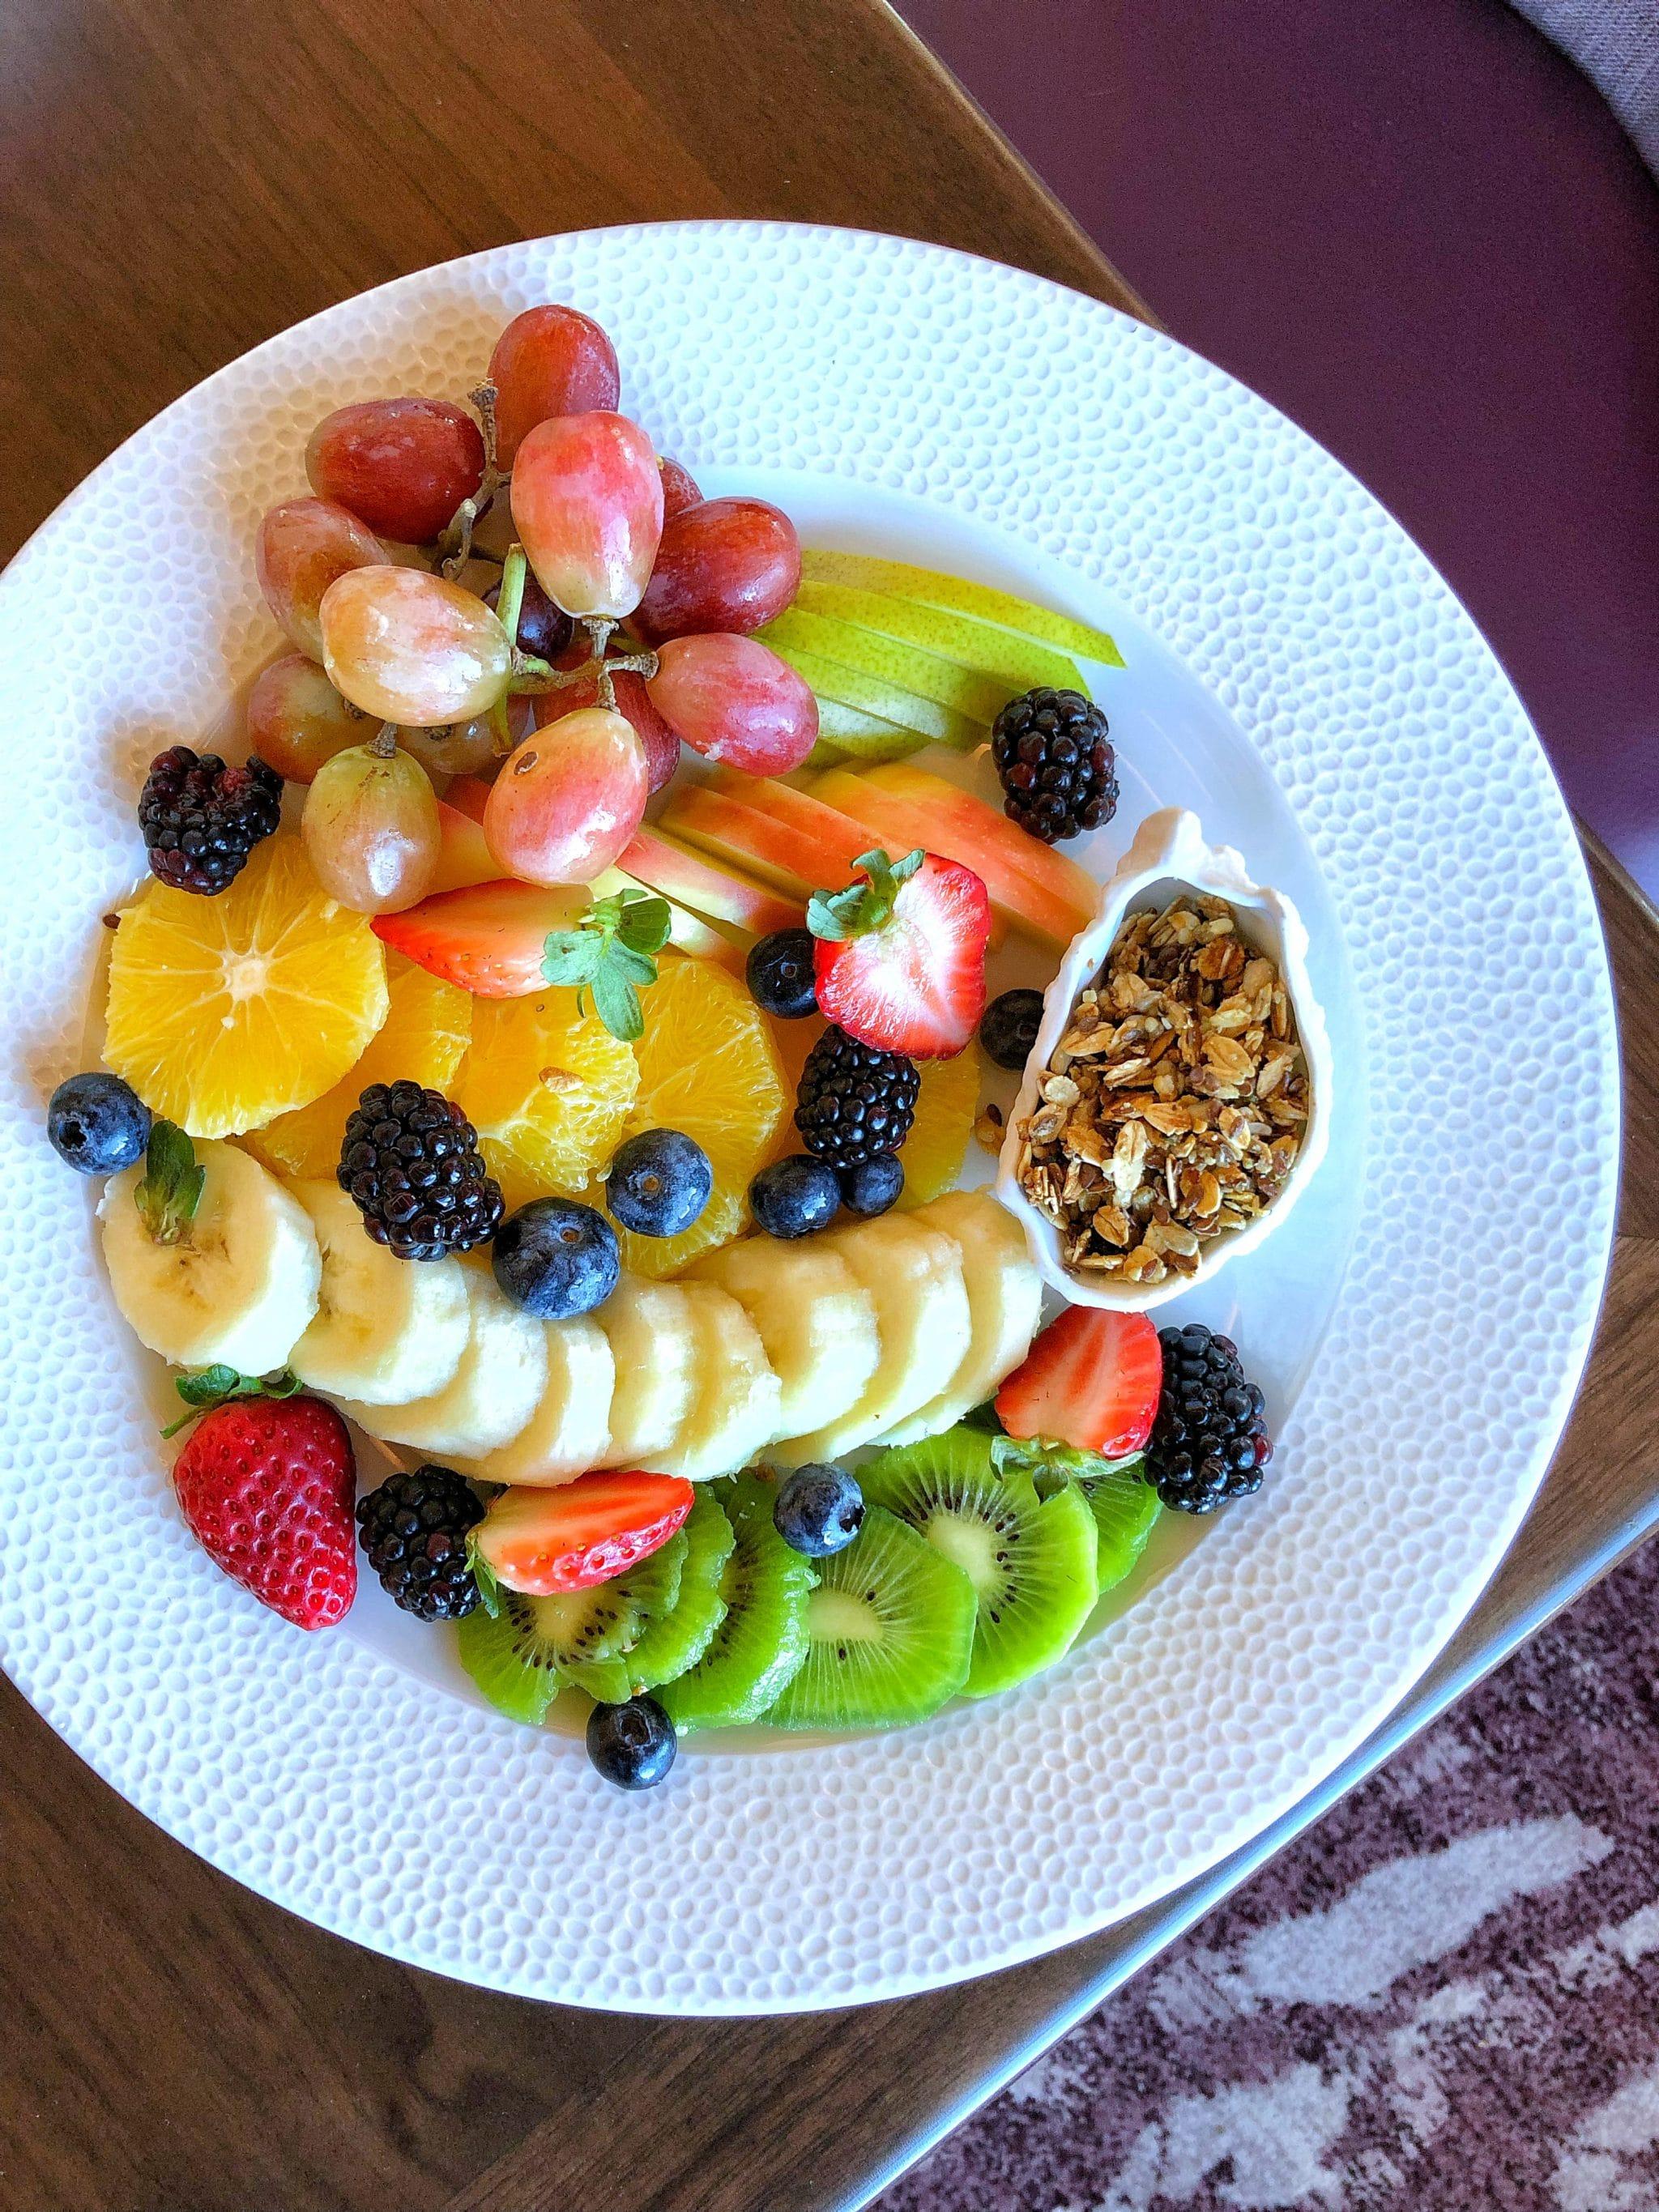 Vegan Character Breakfast at Topolino's Terrace in Disney's Riviera Resort at Walt Disney World